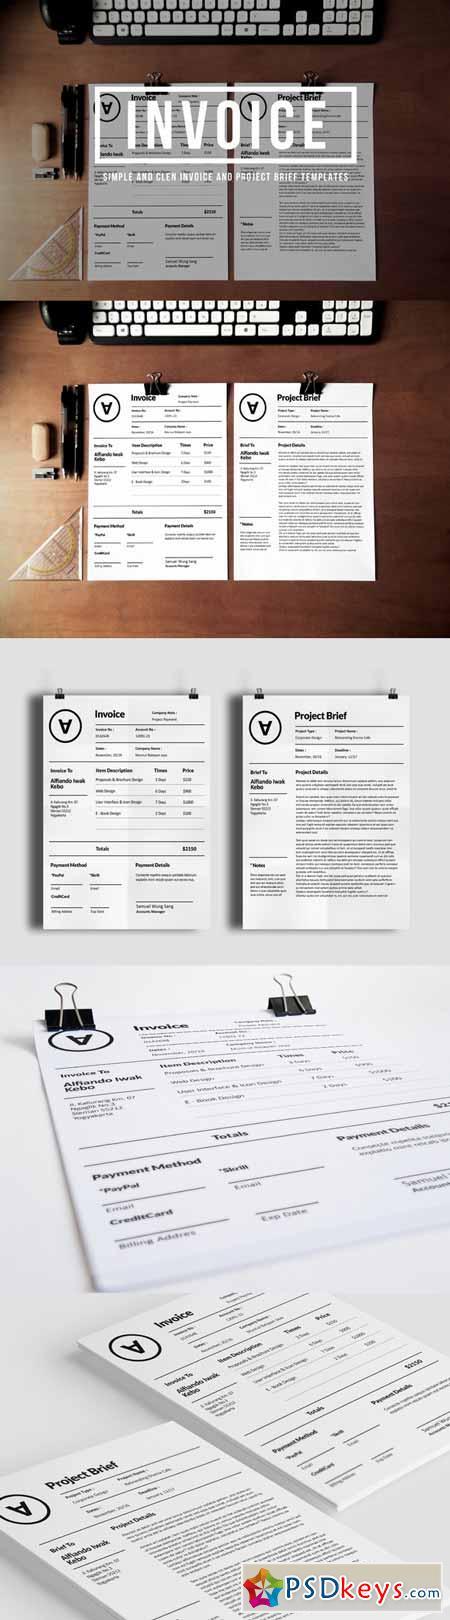 creativemarket 2 simple invoice 98929 – neverage, Simple invoice